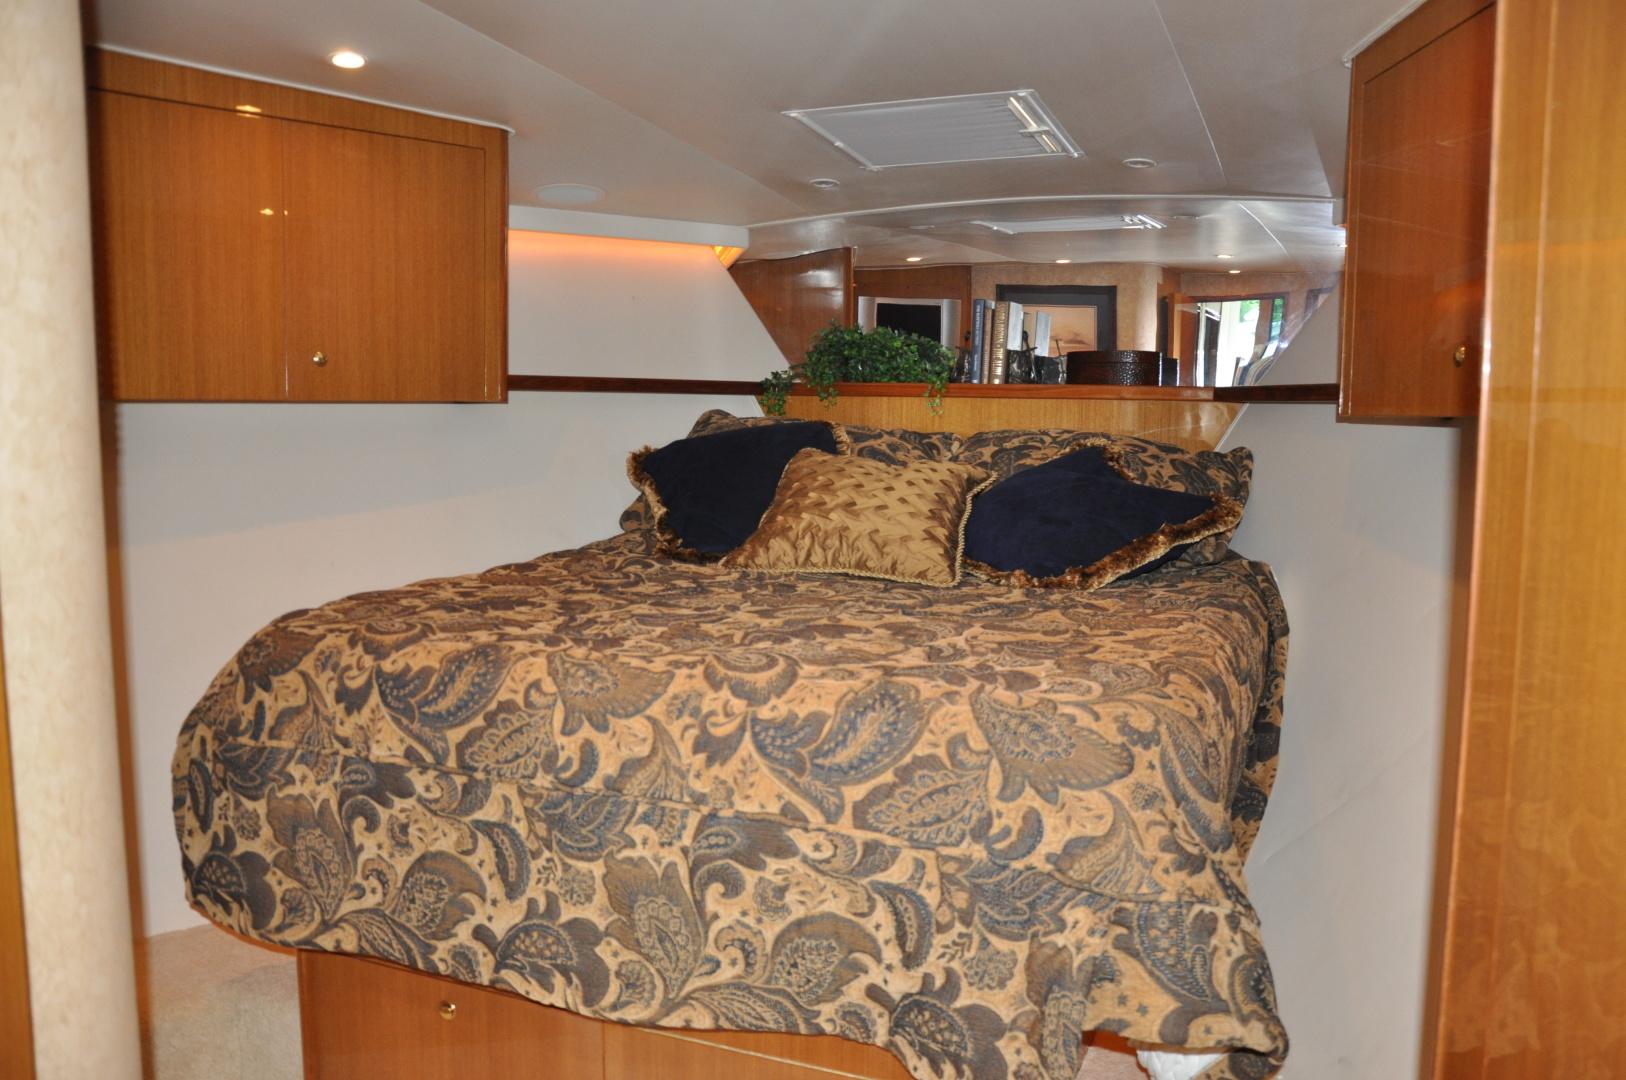 Viking-Convertible 2003-Reel Cowboy Deerfield Beach-Florida-United States-Master Stateroom-1546873 | Thumbnail